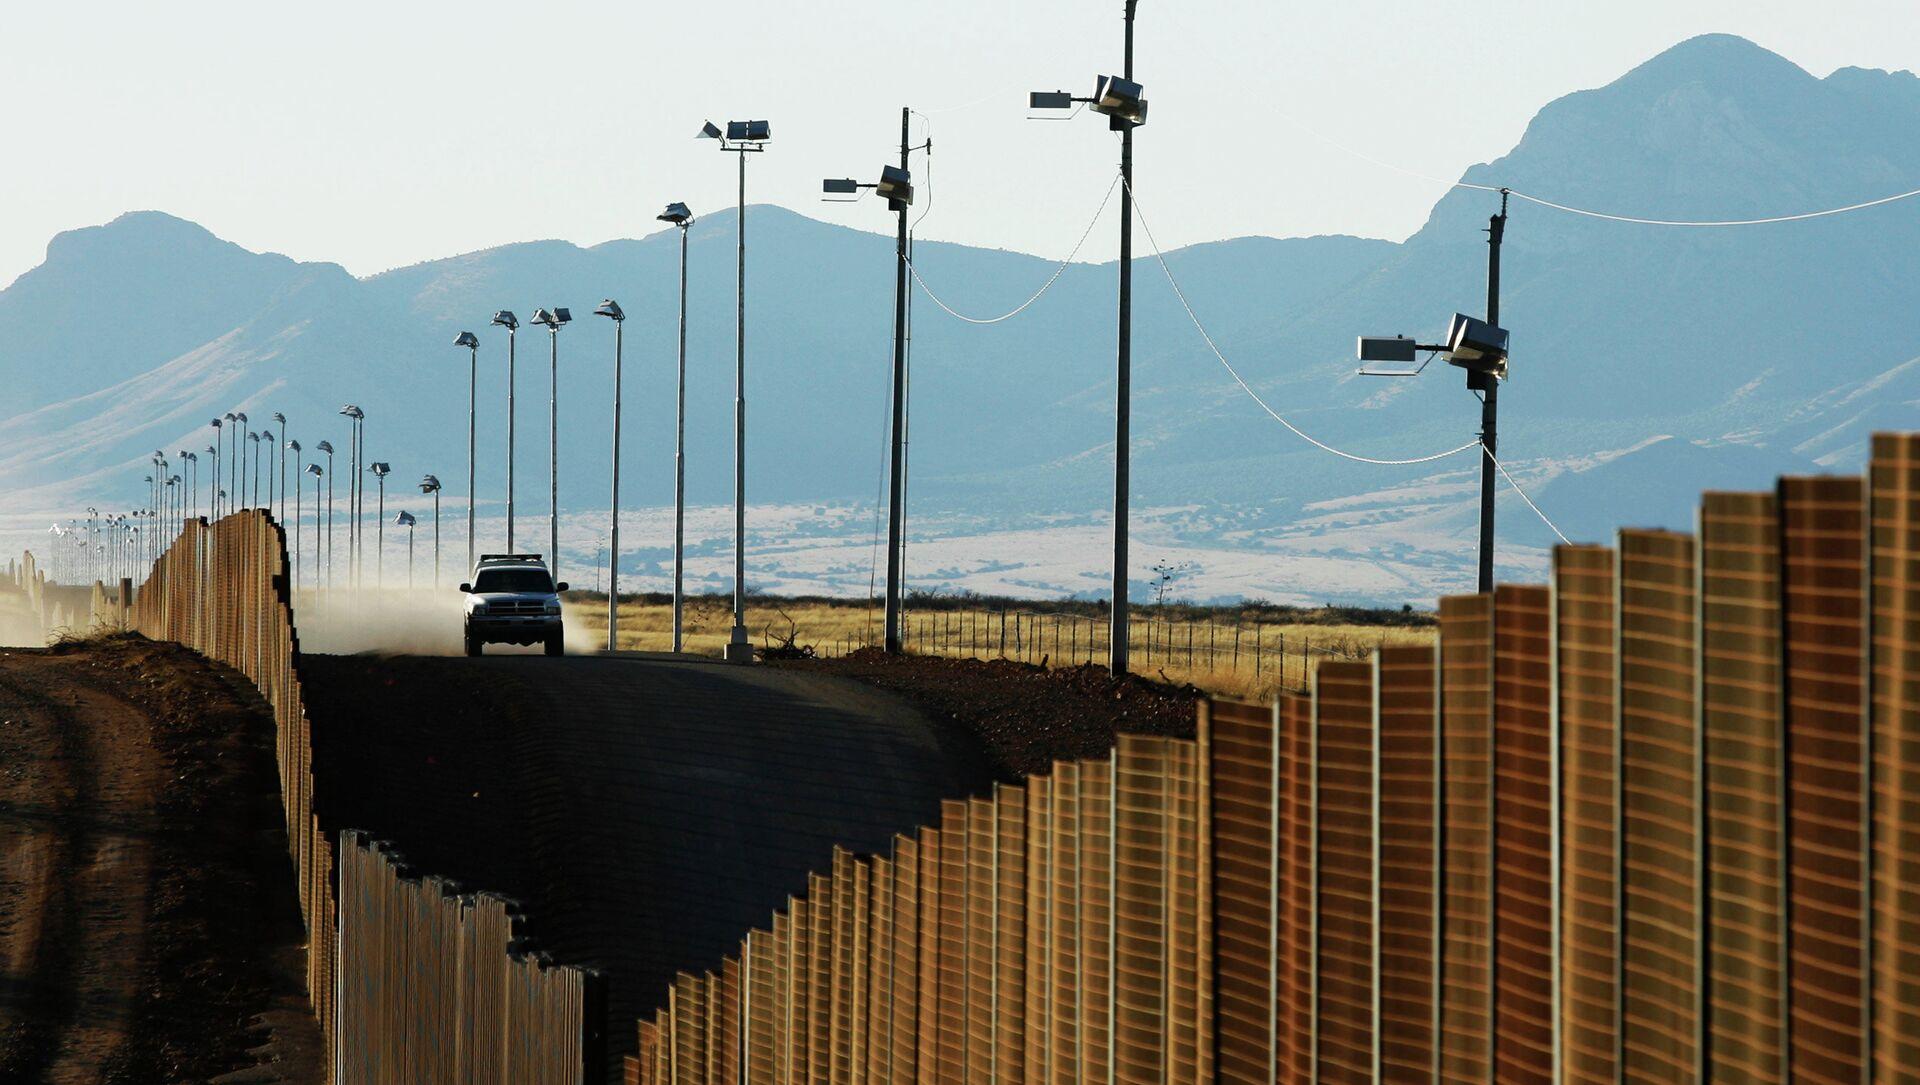 US border patrol vehicle rides along the fence at the US-Mexican border near Naco, Mexico, Sunday, Jan. 13, 2008 - Sputnik International, 1920, 30.06.2021